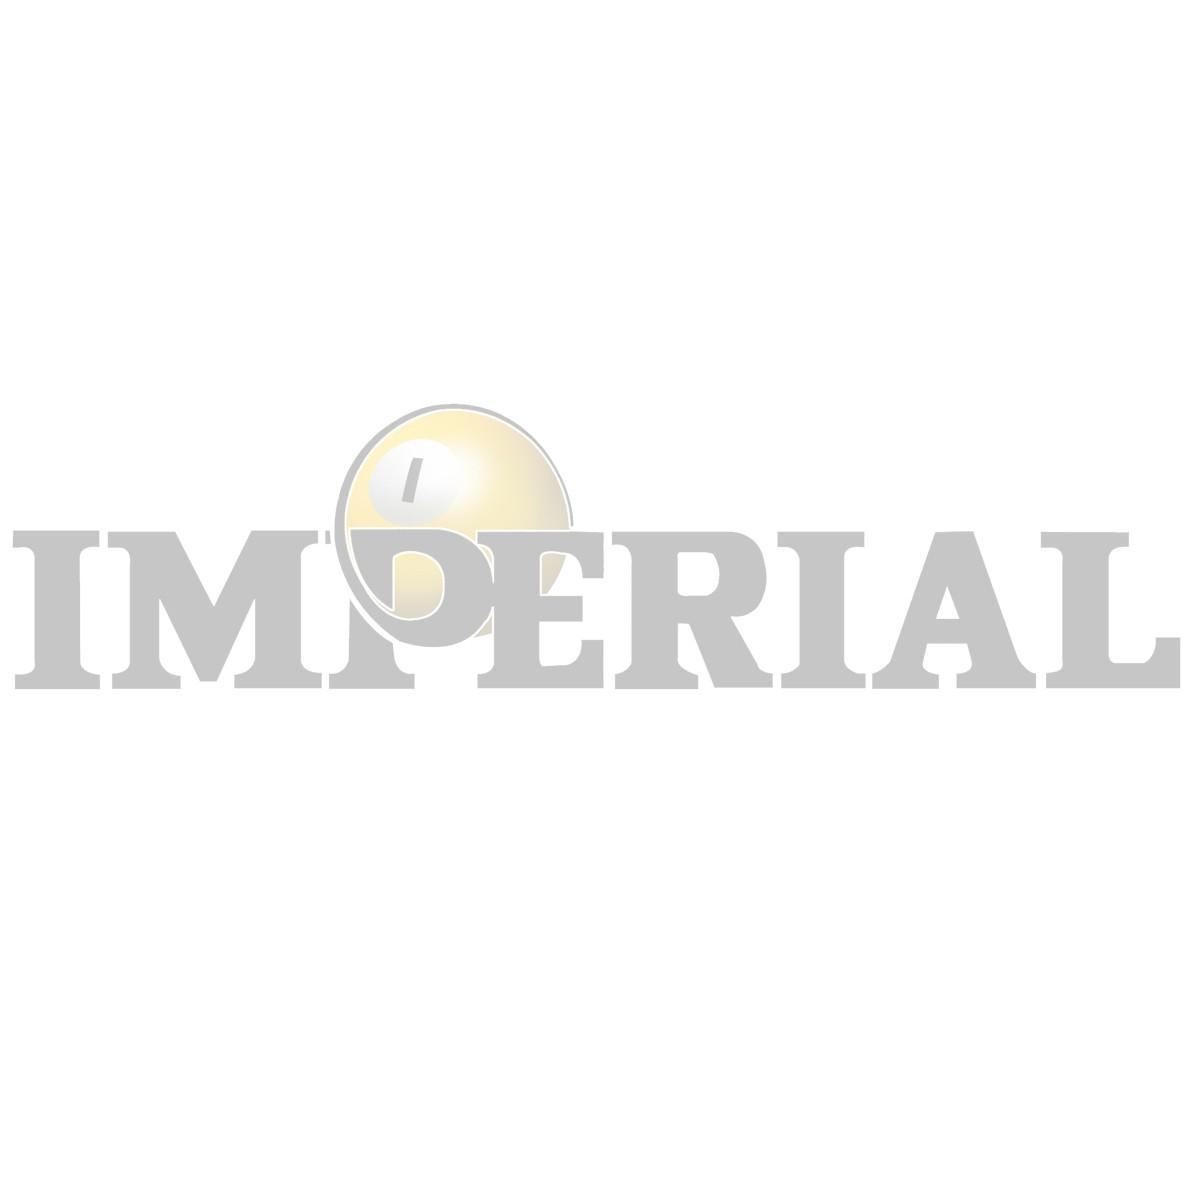 UNIVERSITY OF MICHIGAN PUB CAPTAINS CHAIR, NAVY